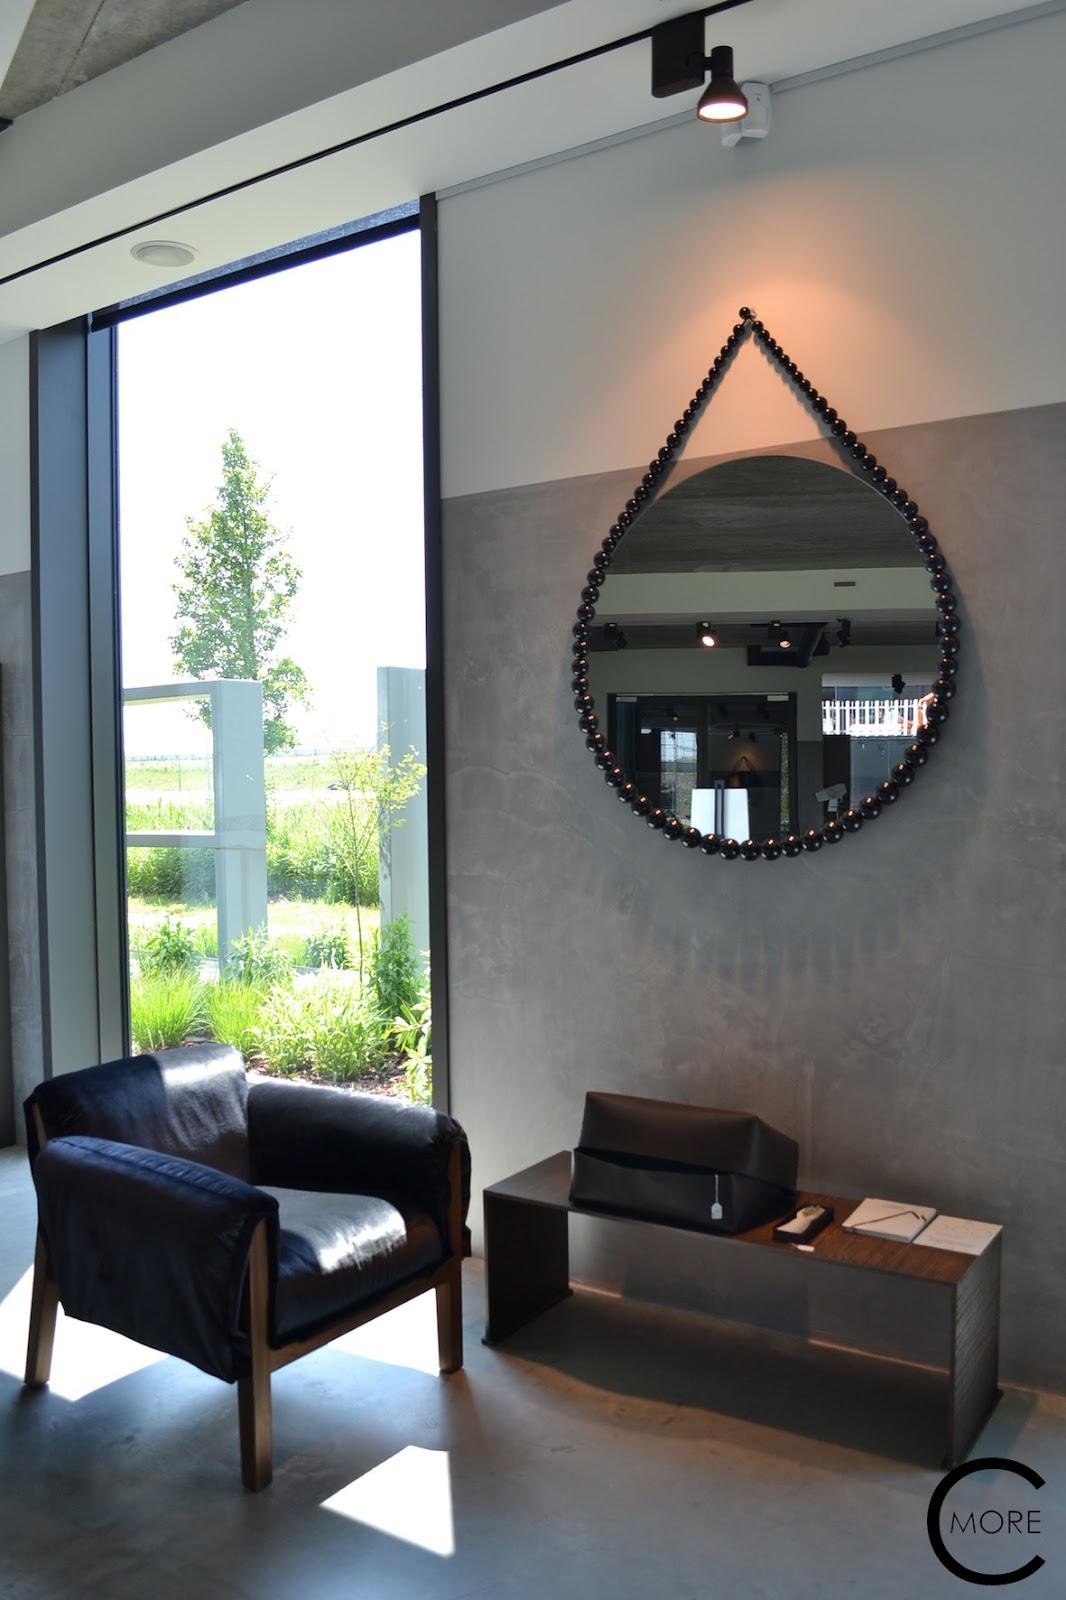 C more interieuradvies blog interior and design blog piet for Afbeeldingen interieur